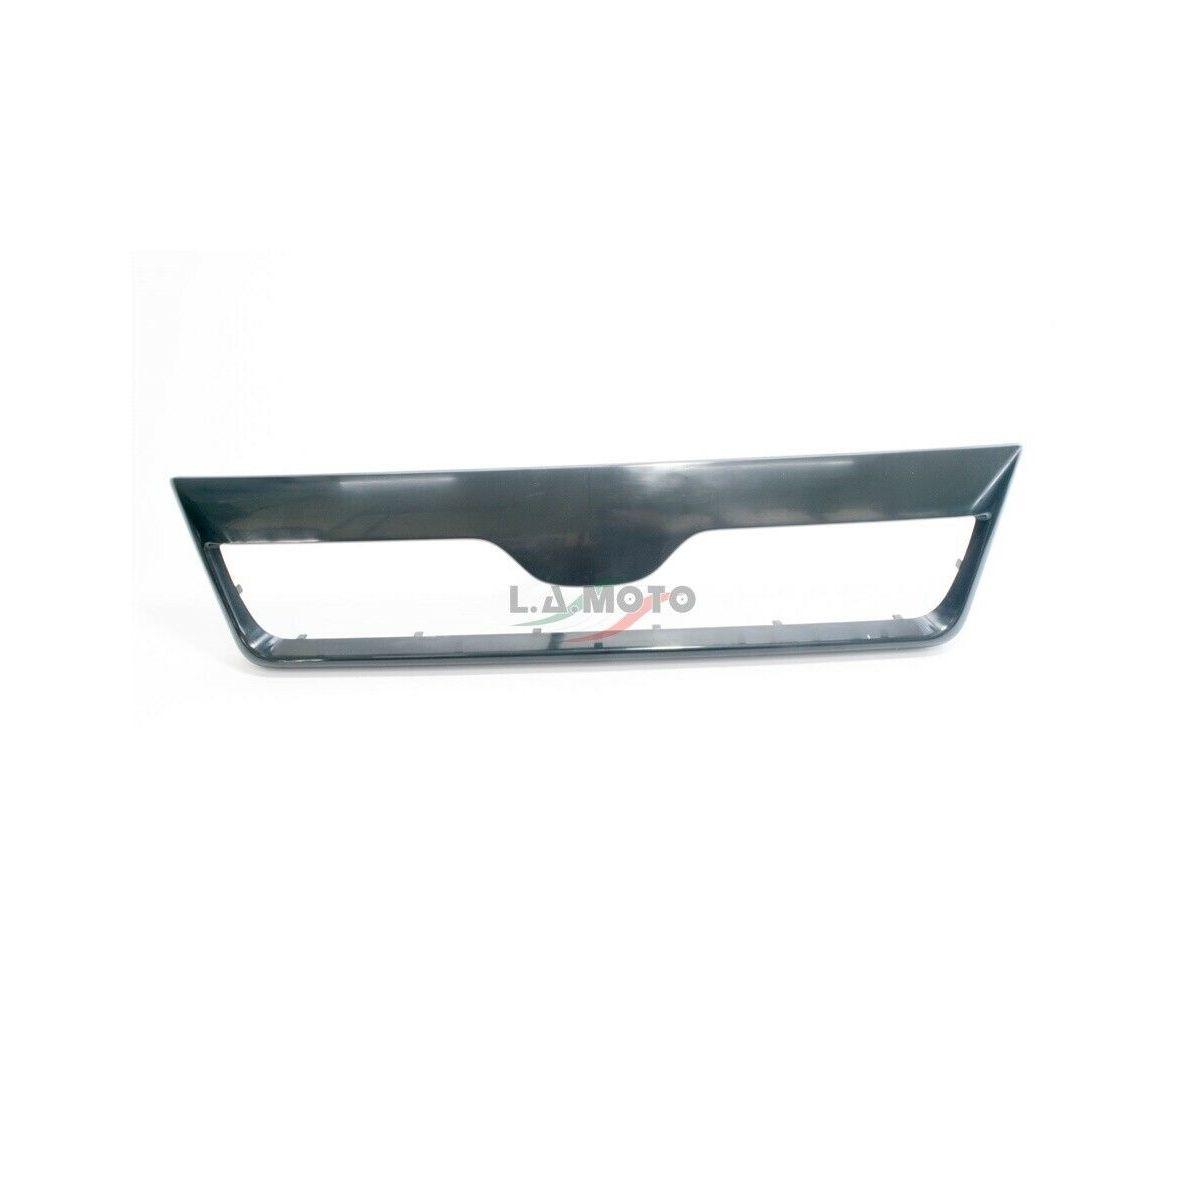 566256-Mascherina anteriore...